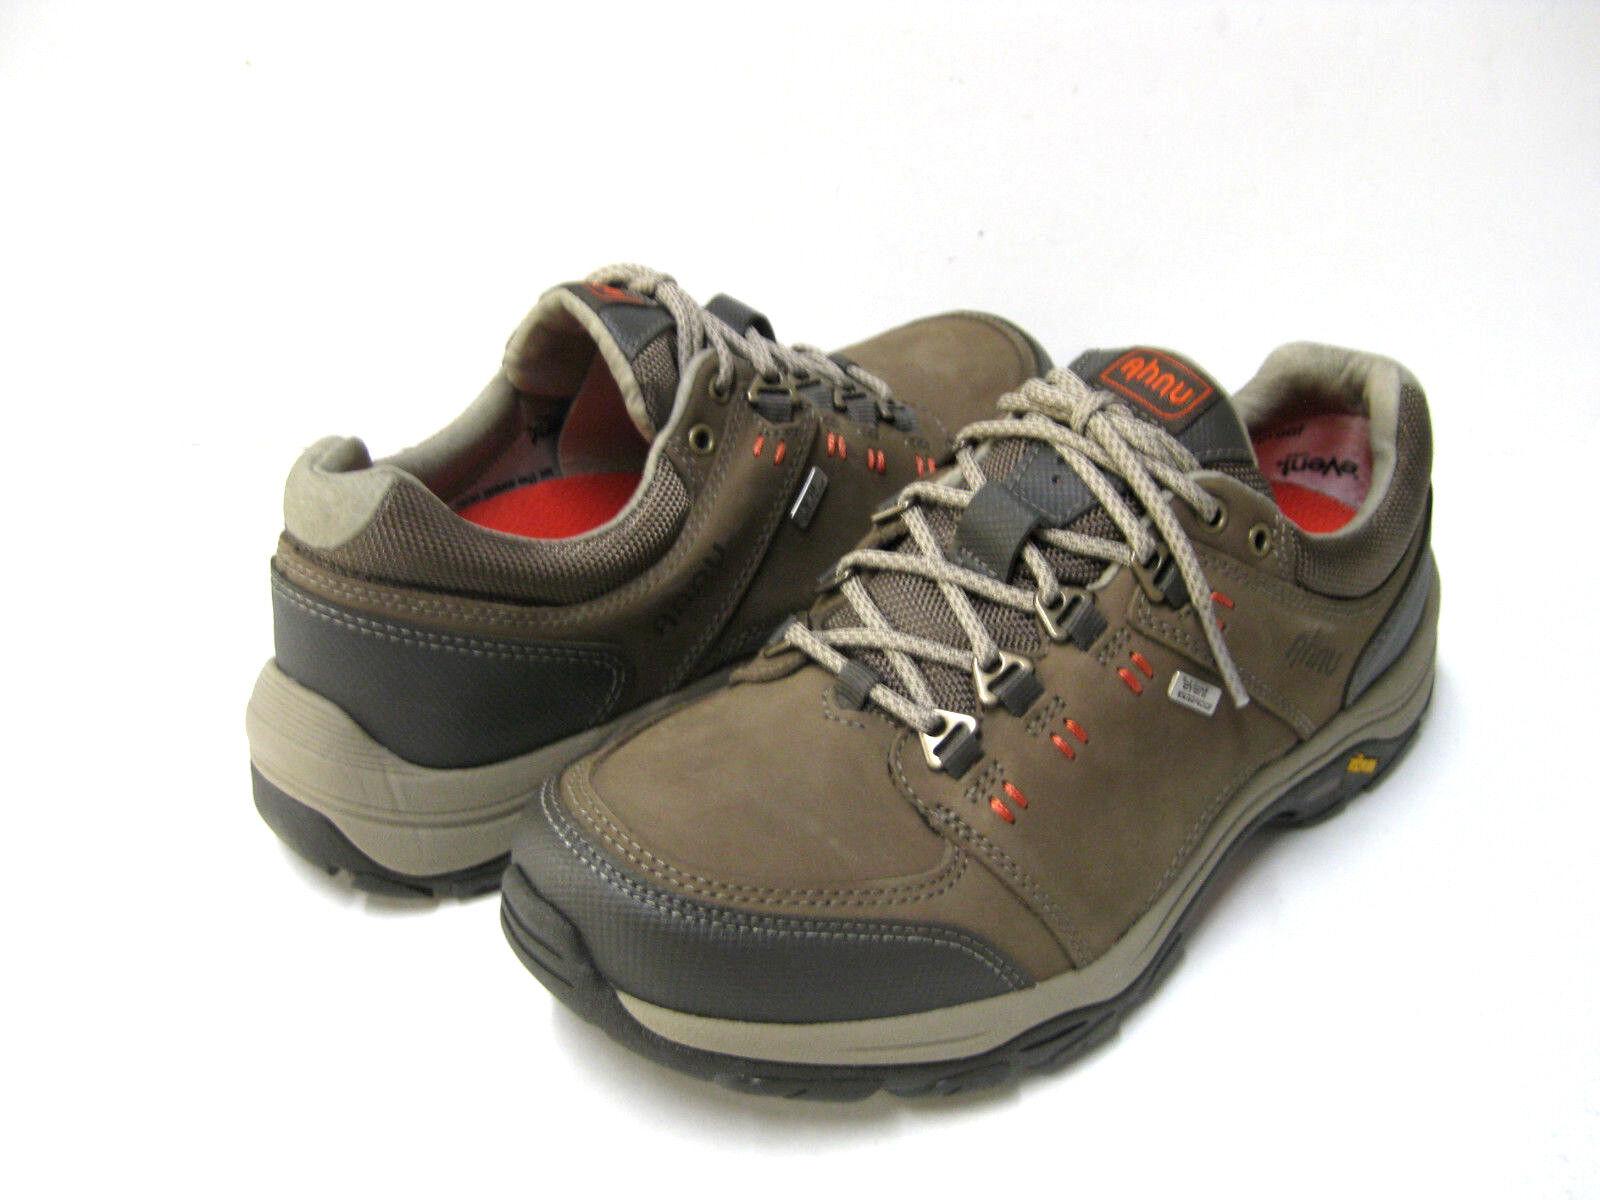 AHNU MONTARA III WOMEN HIKING Schuhe LEATHER CHOCOLATE CHIP CHIP CHOCOLATE US 8 /UK6.5 /EU39 b9543e